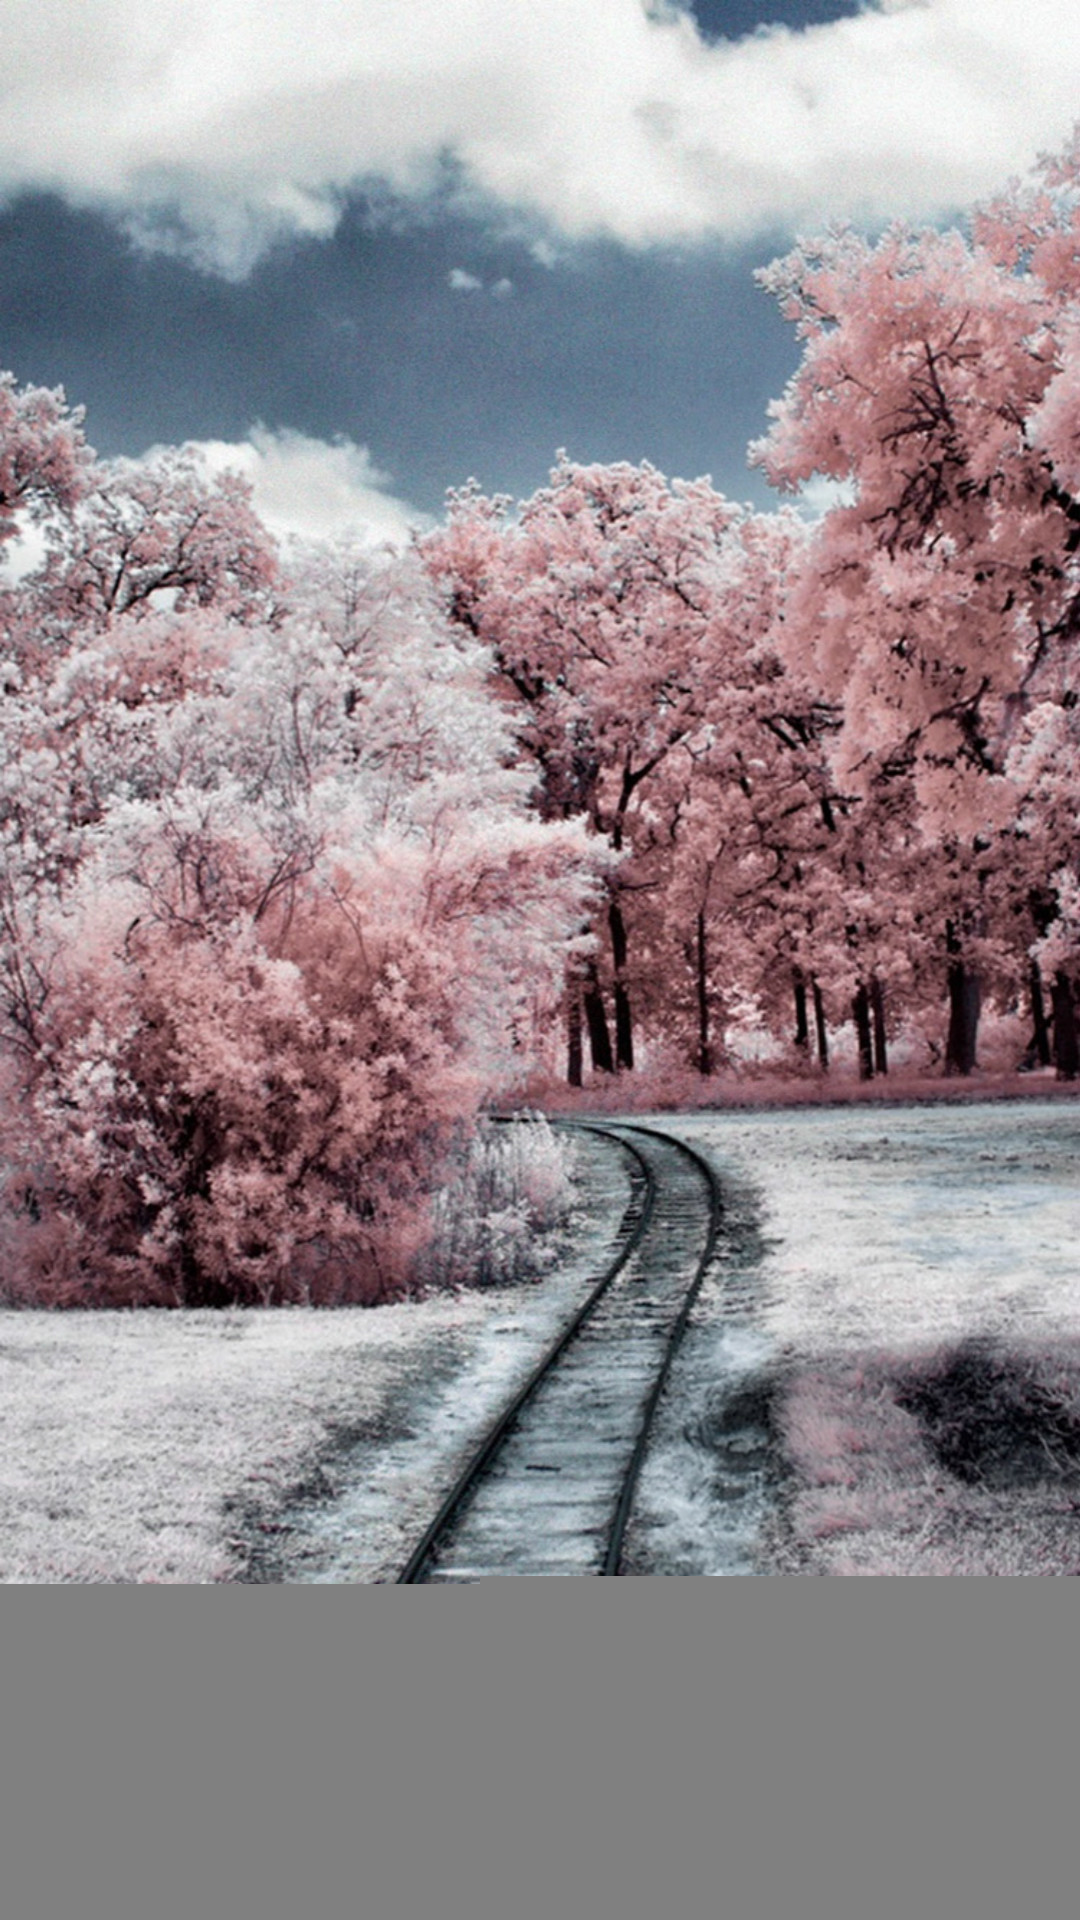 Winter Wallpaper iPhone 6 Plus 82 images 1080x1920